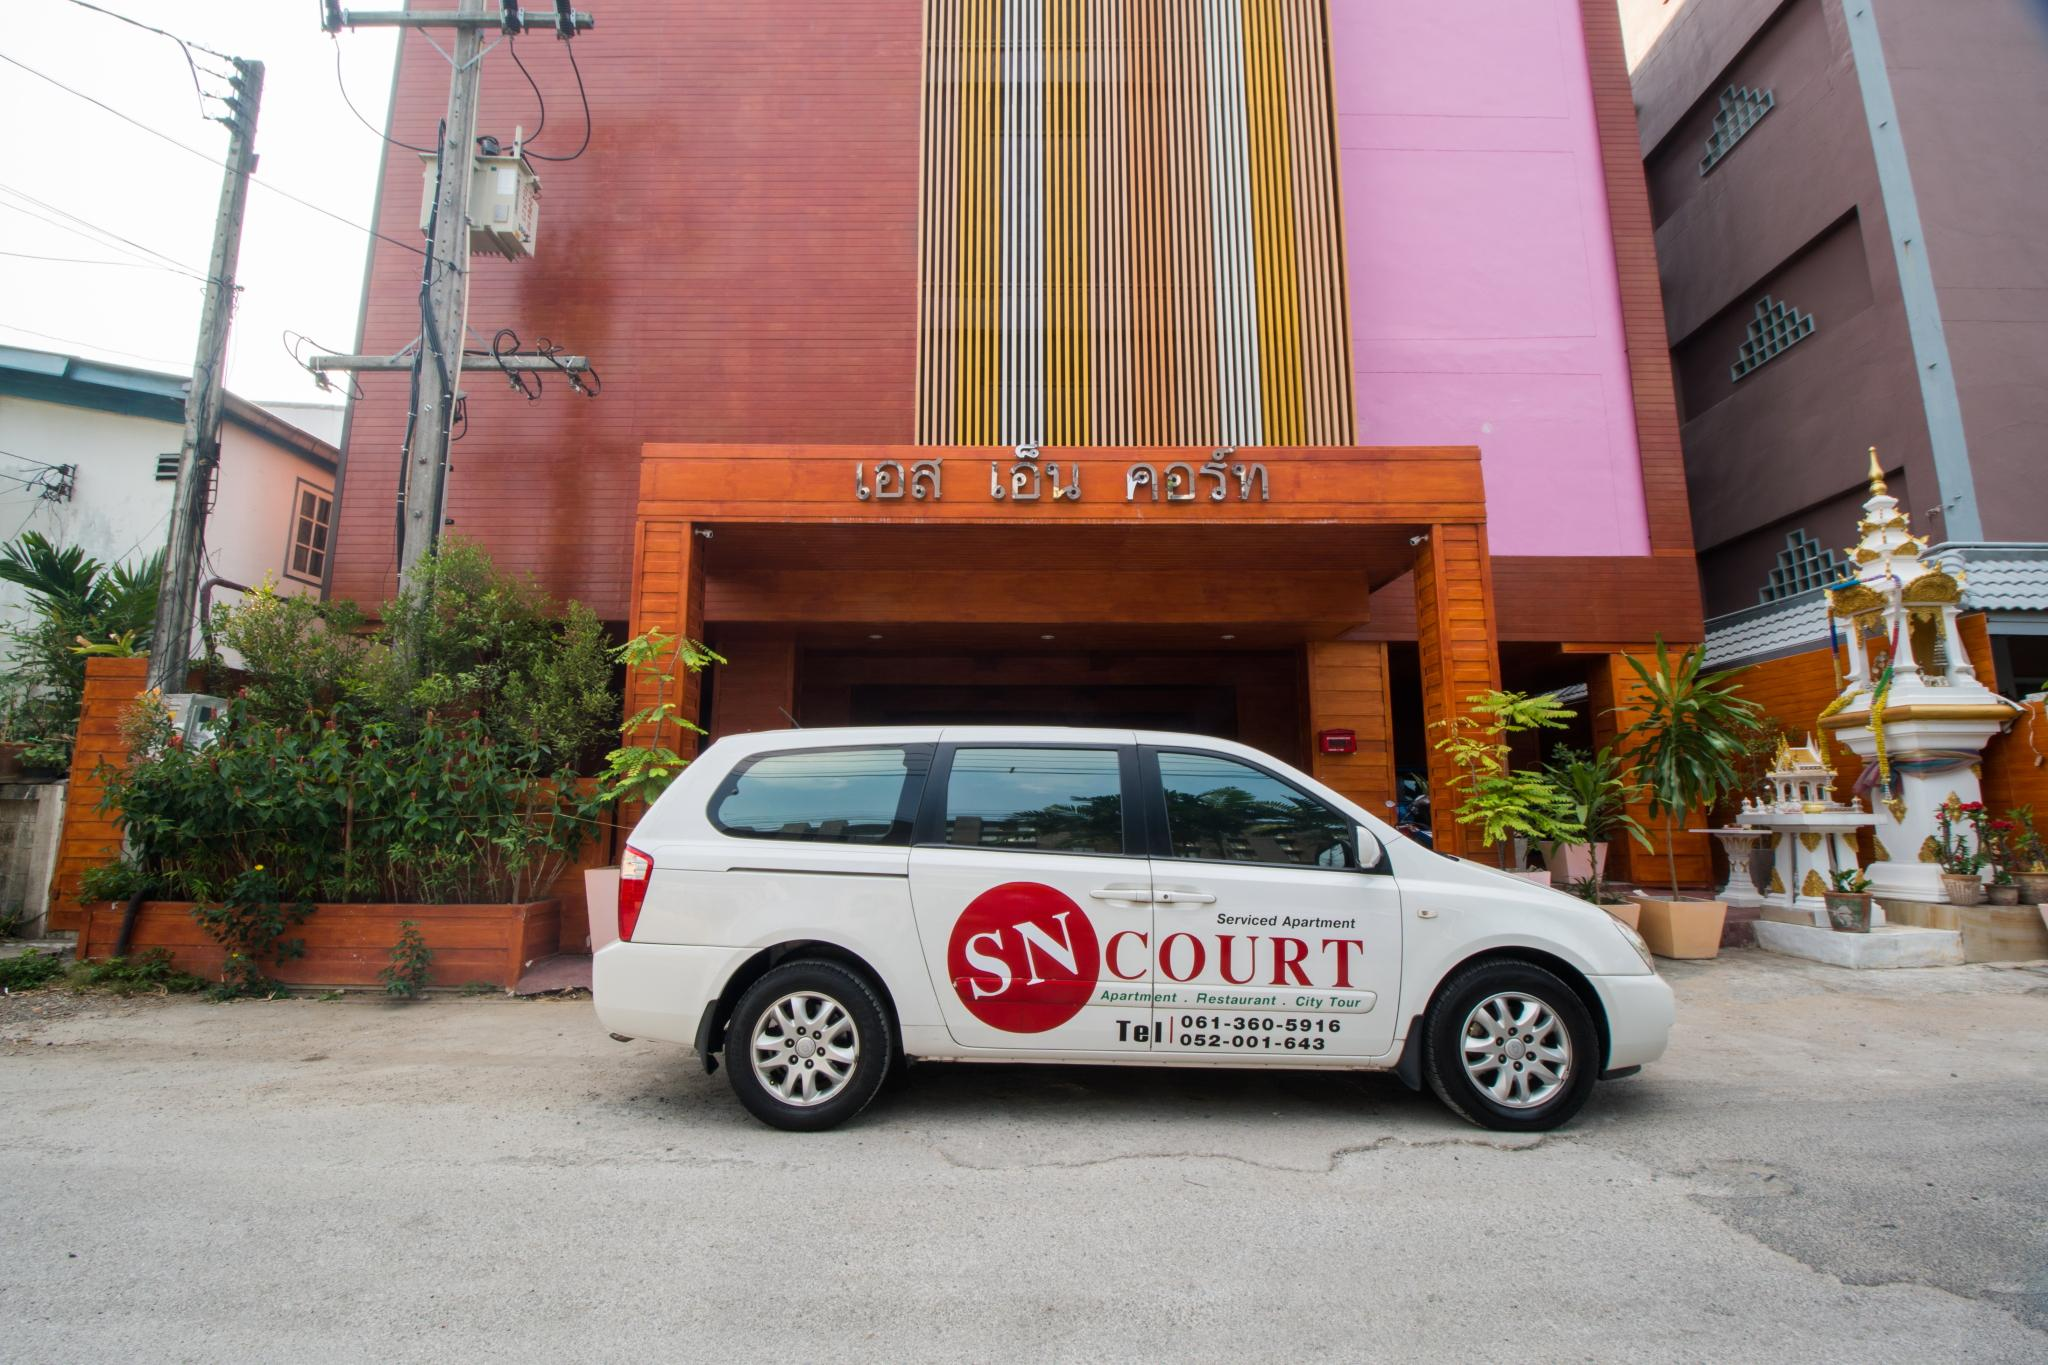 SN Court Serviced Apartment